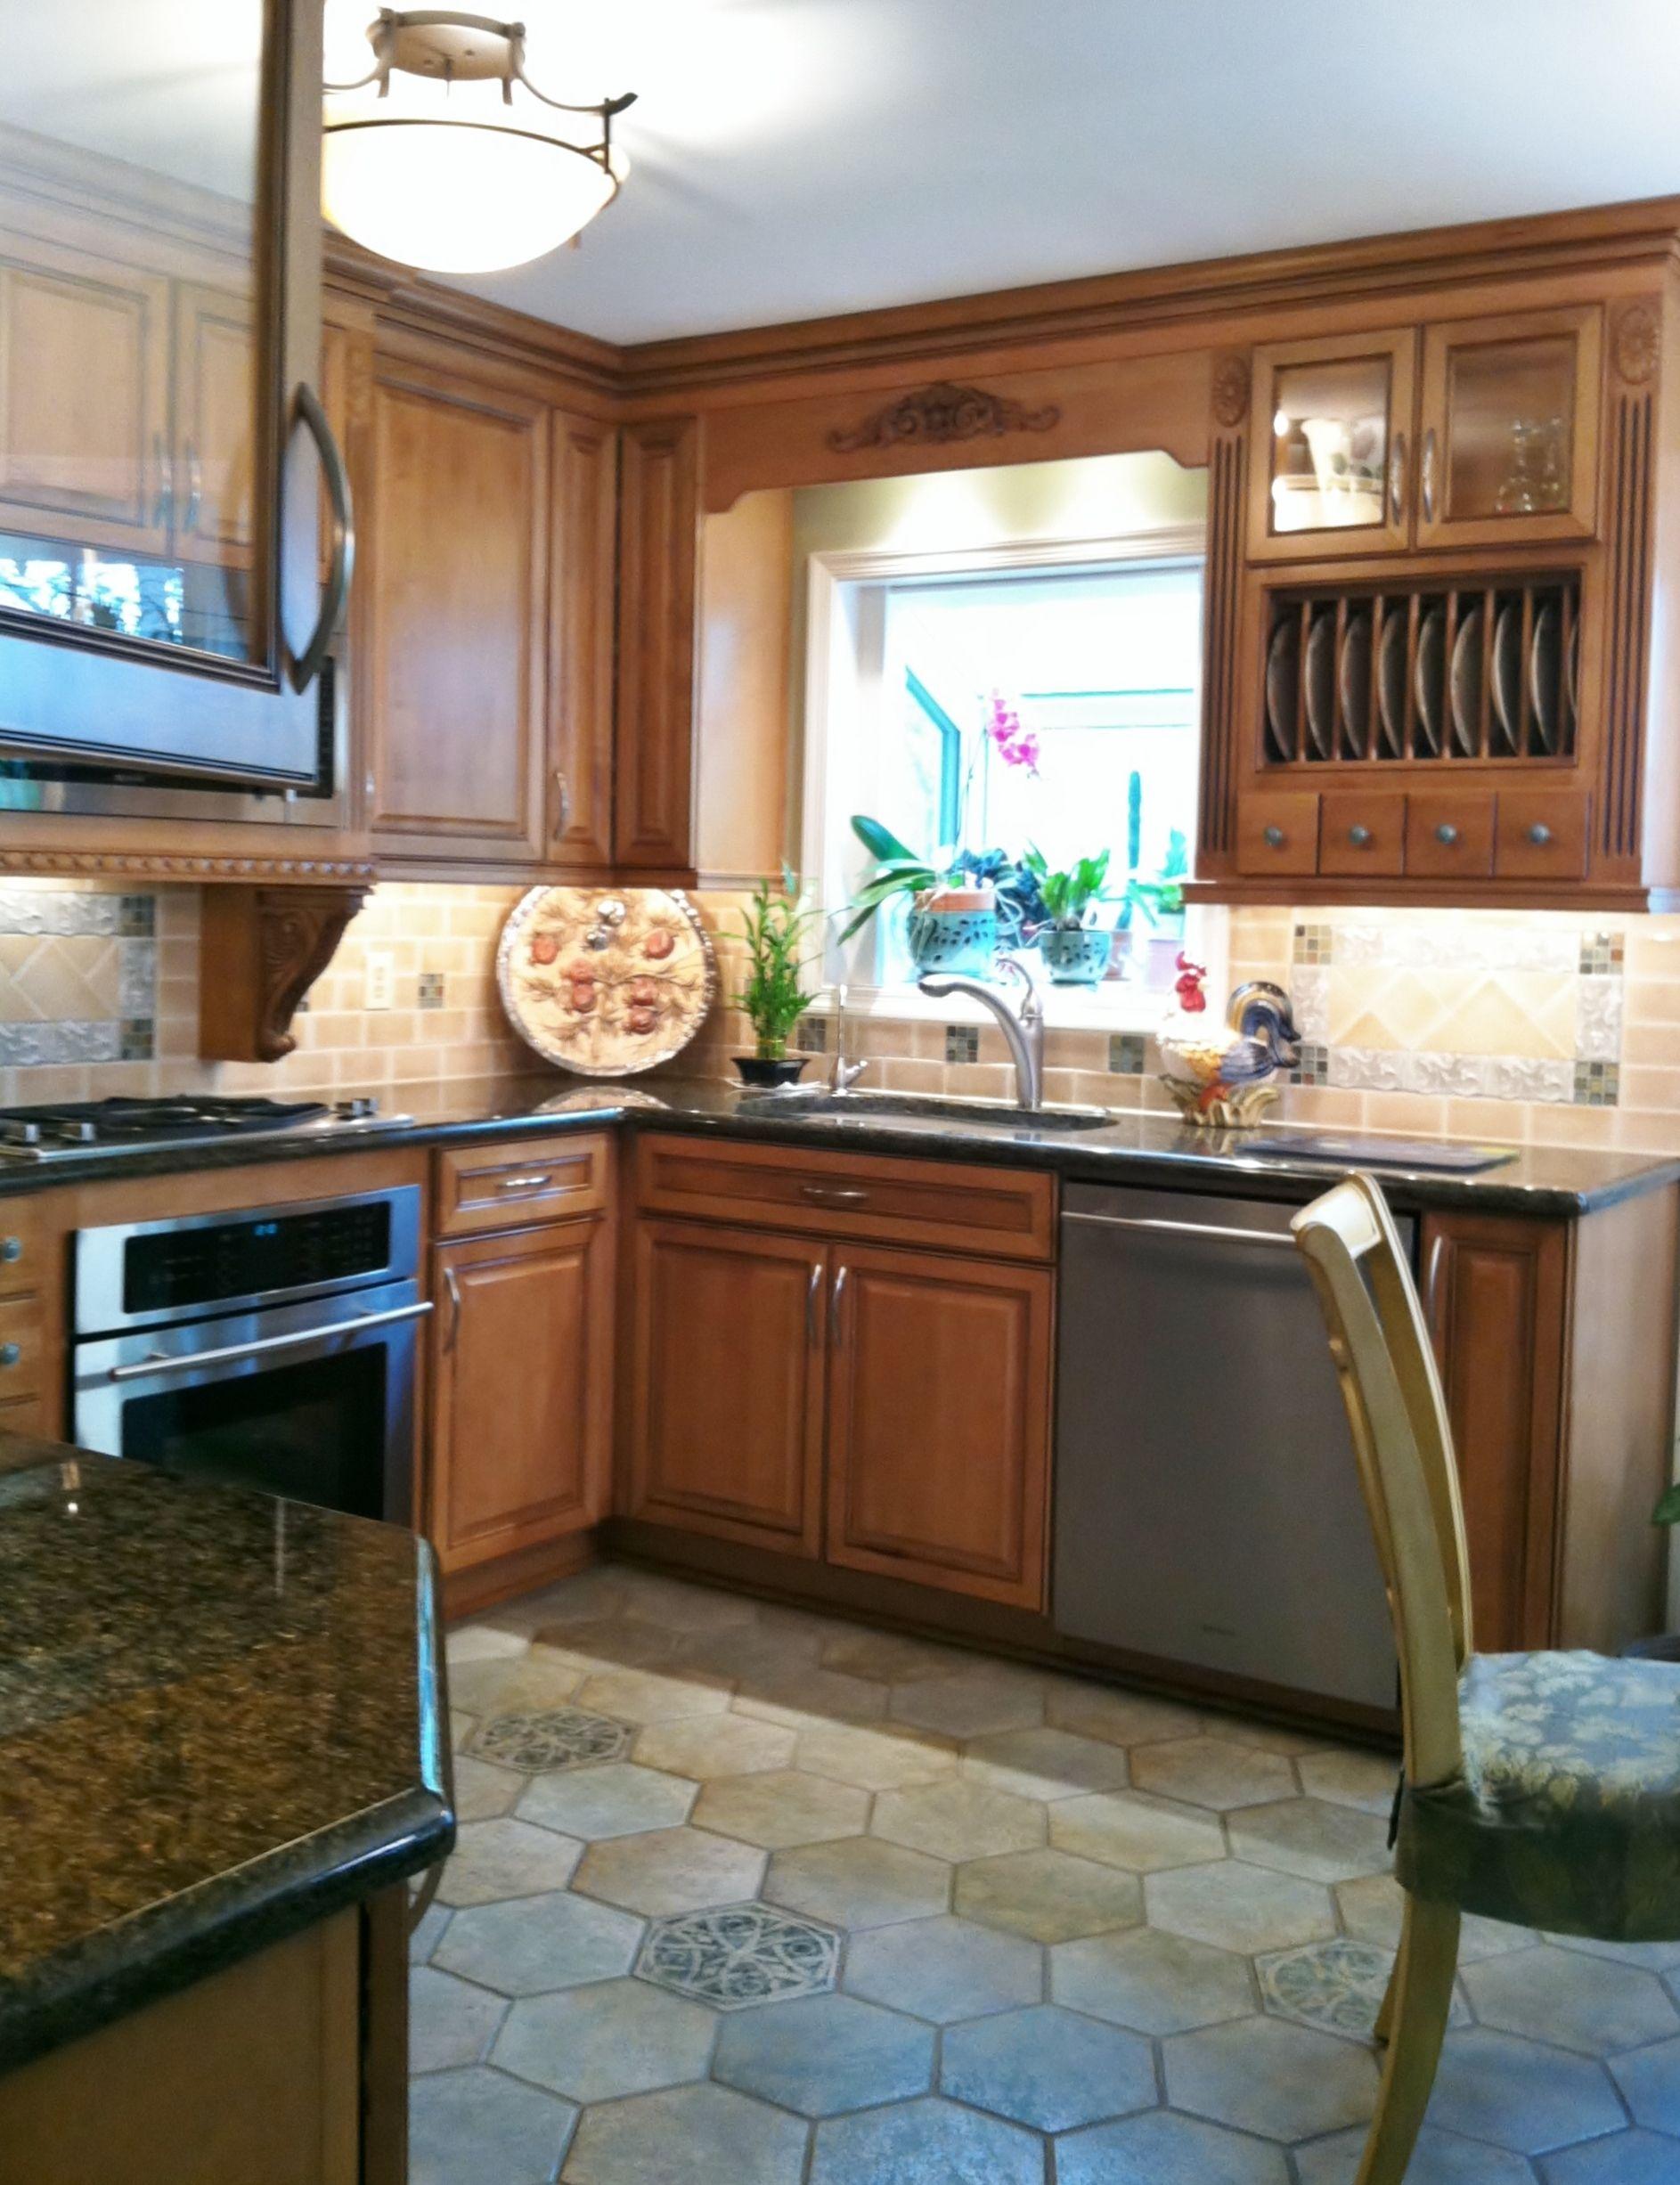 Window for kitchen  kitchen cabinets with windows above  navigatorspbfo